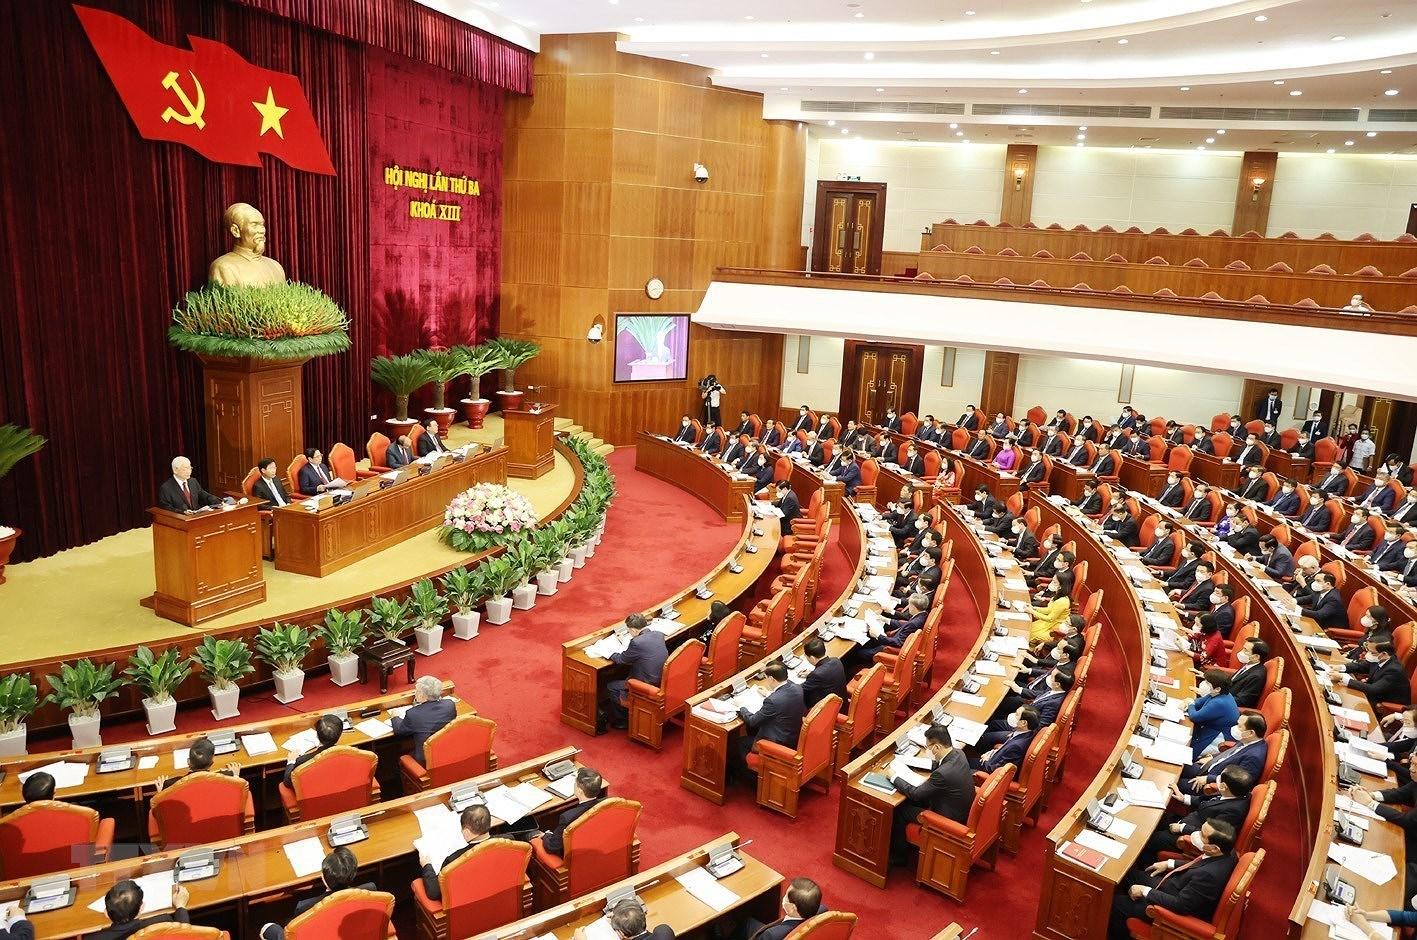 Hinh anh khai mac Hoi nghi lan thu ba Ban Chap hanh TW Dang khoa XIII hinh anh 7